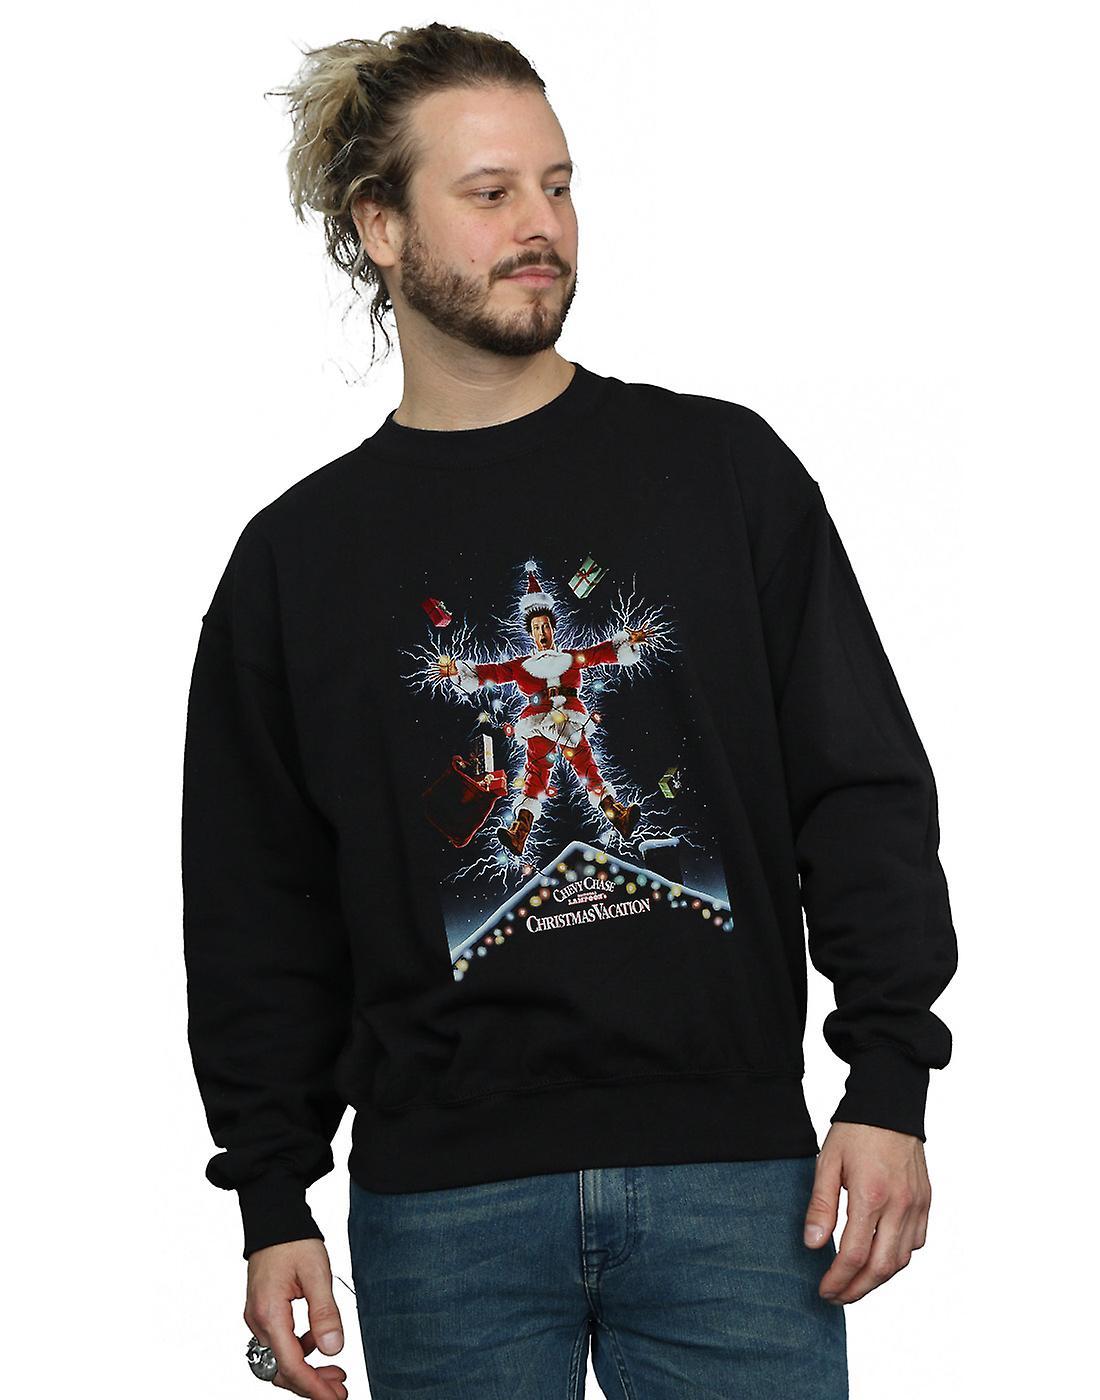 National Lampoon's Christmas Vacation Men's Poster Sweatshirt